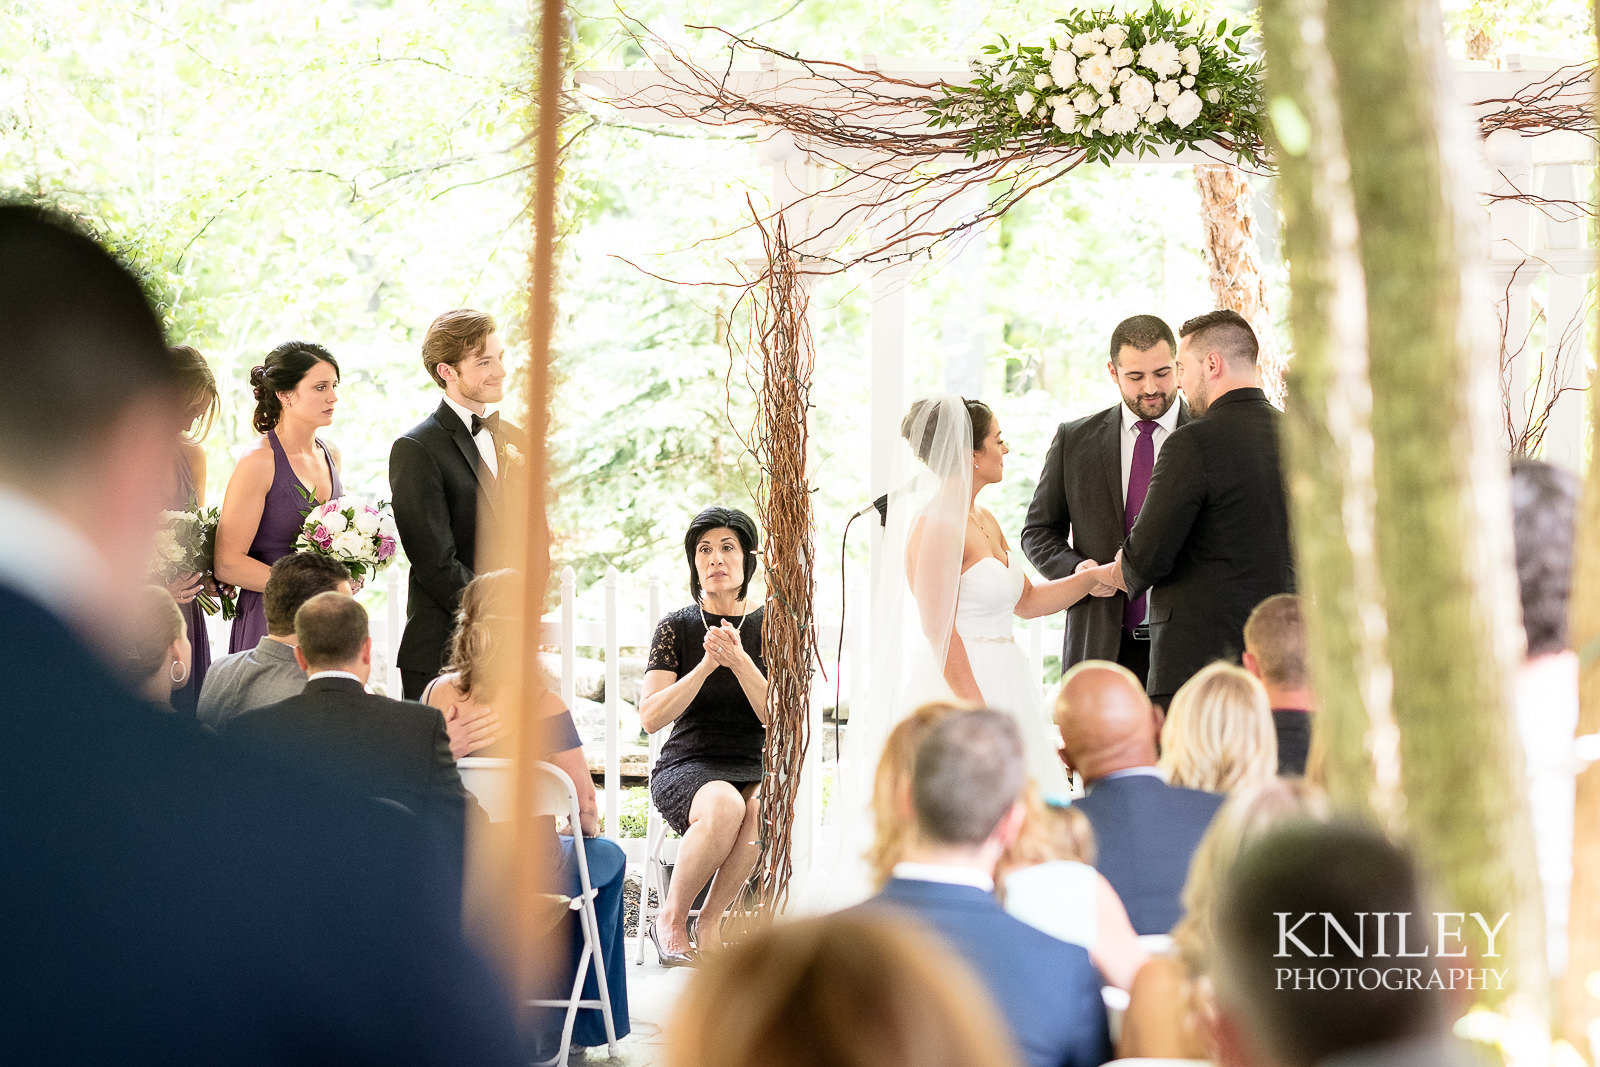 076 - Klocs Grove Buffalo NY Wedding Pictures -XT2A8304.jpg